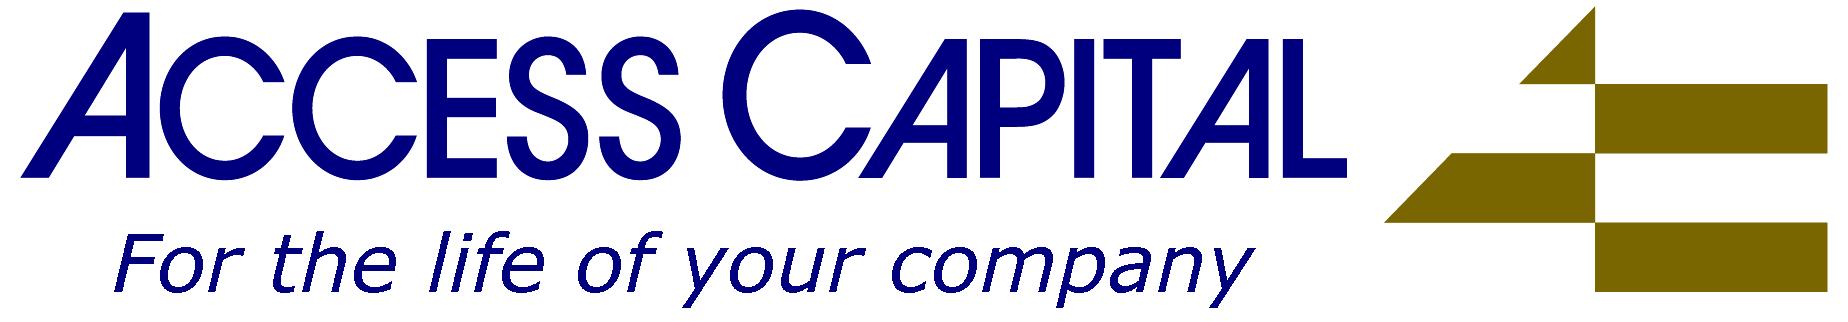 Access Capital, Inc.